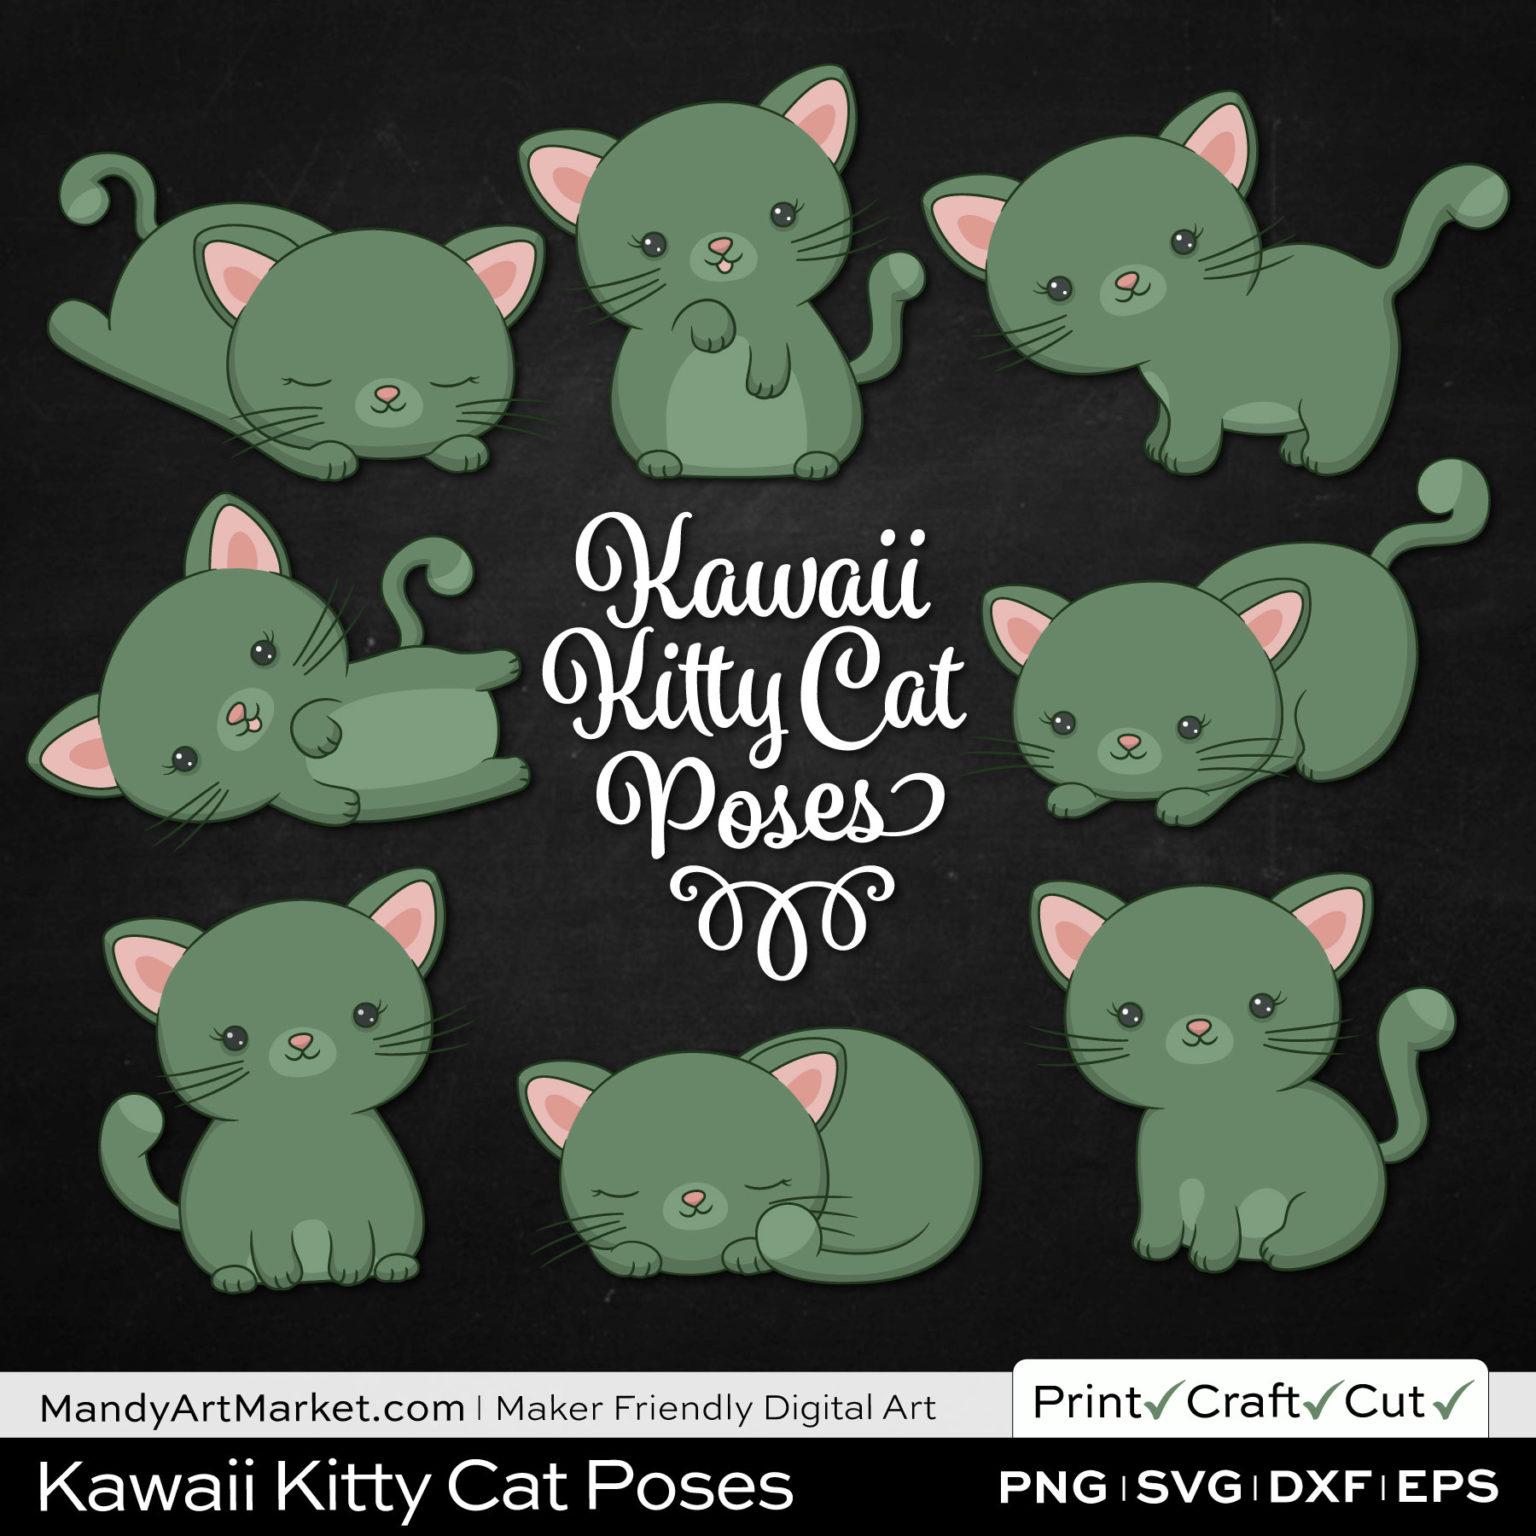 Artichoke Green Kawaii Kitty Cat Poses Clipart on Black Background